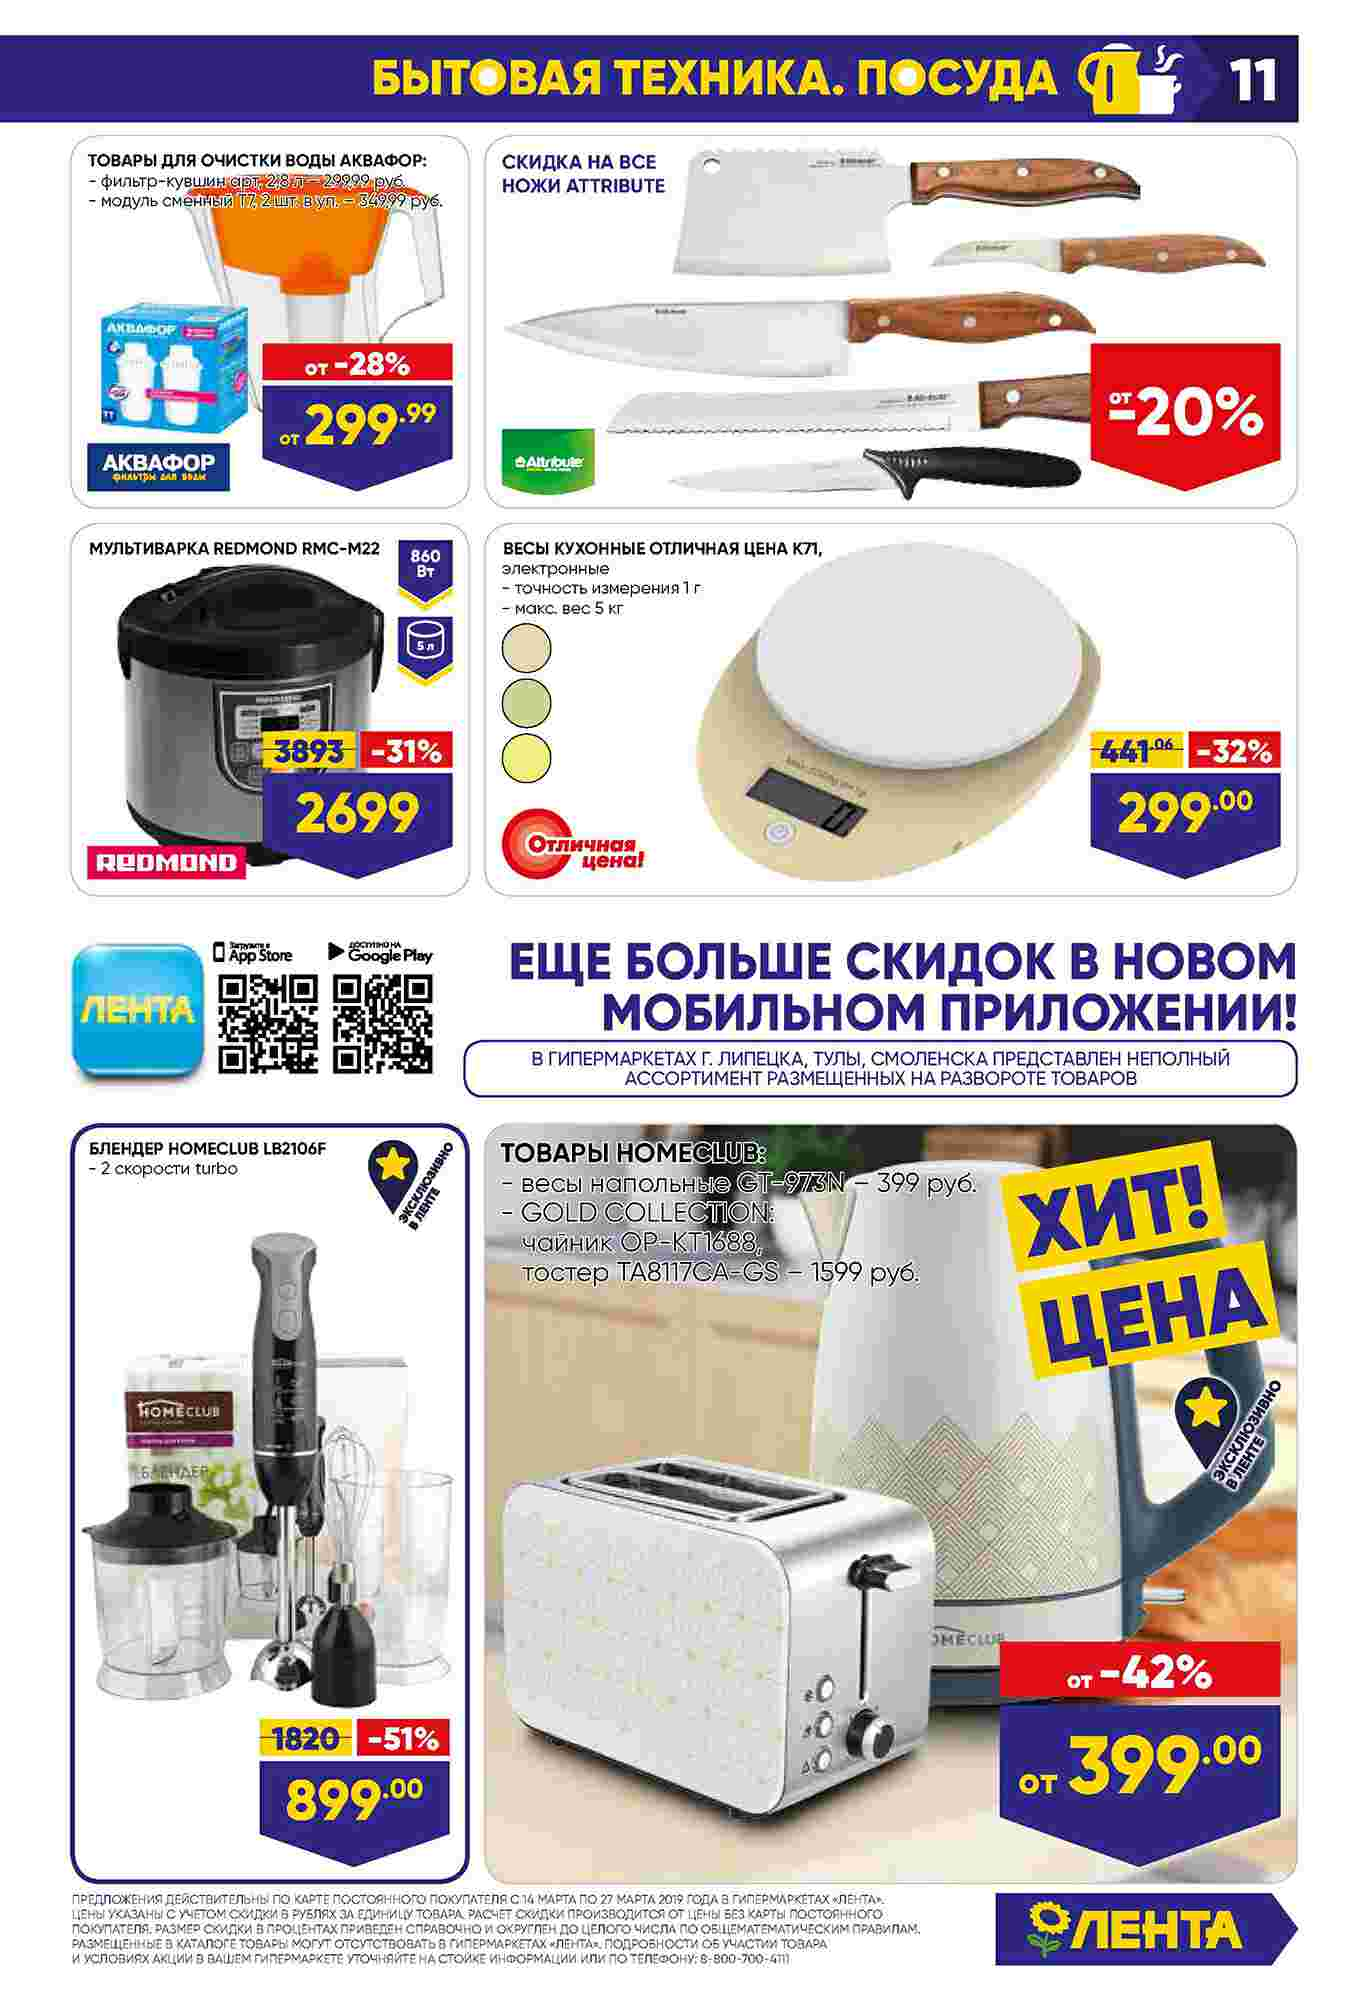 Каталог Лента гипермаркет 14-27.03.2019 стр. - 0001 - 0011